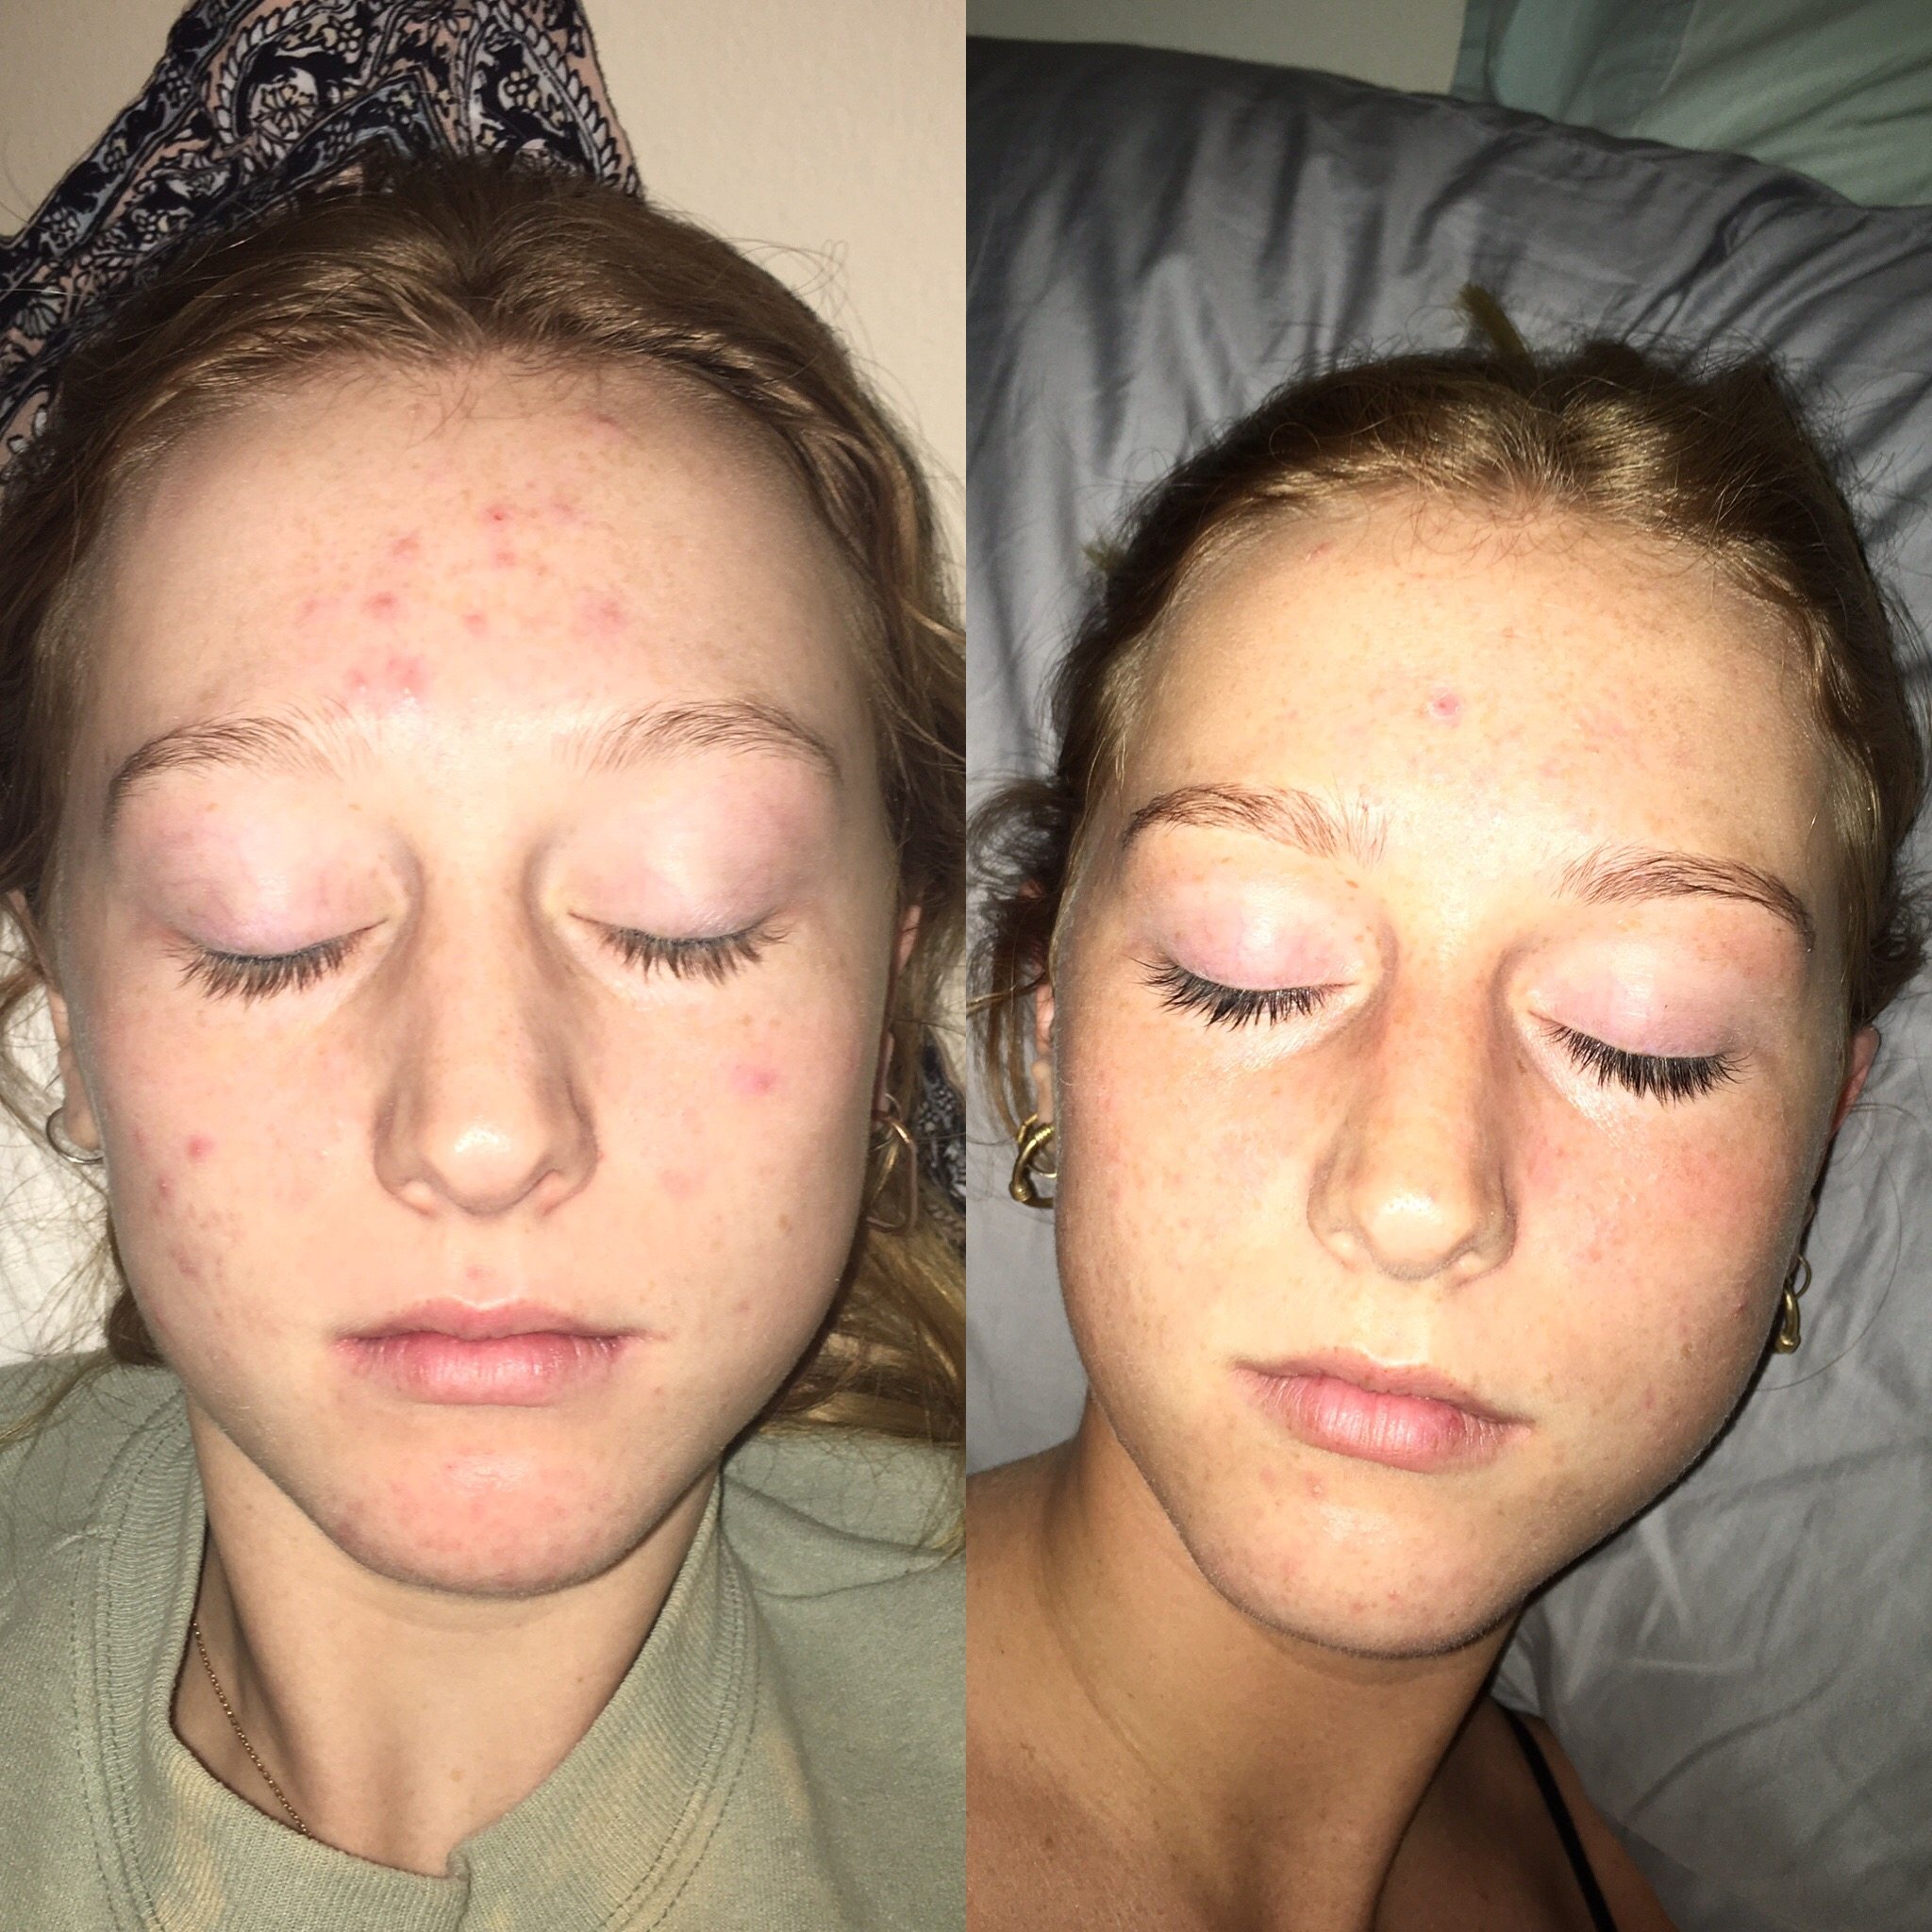 can kyleena cause acne